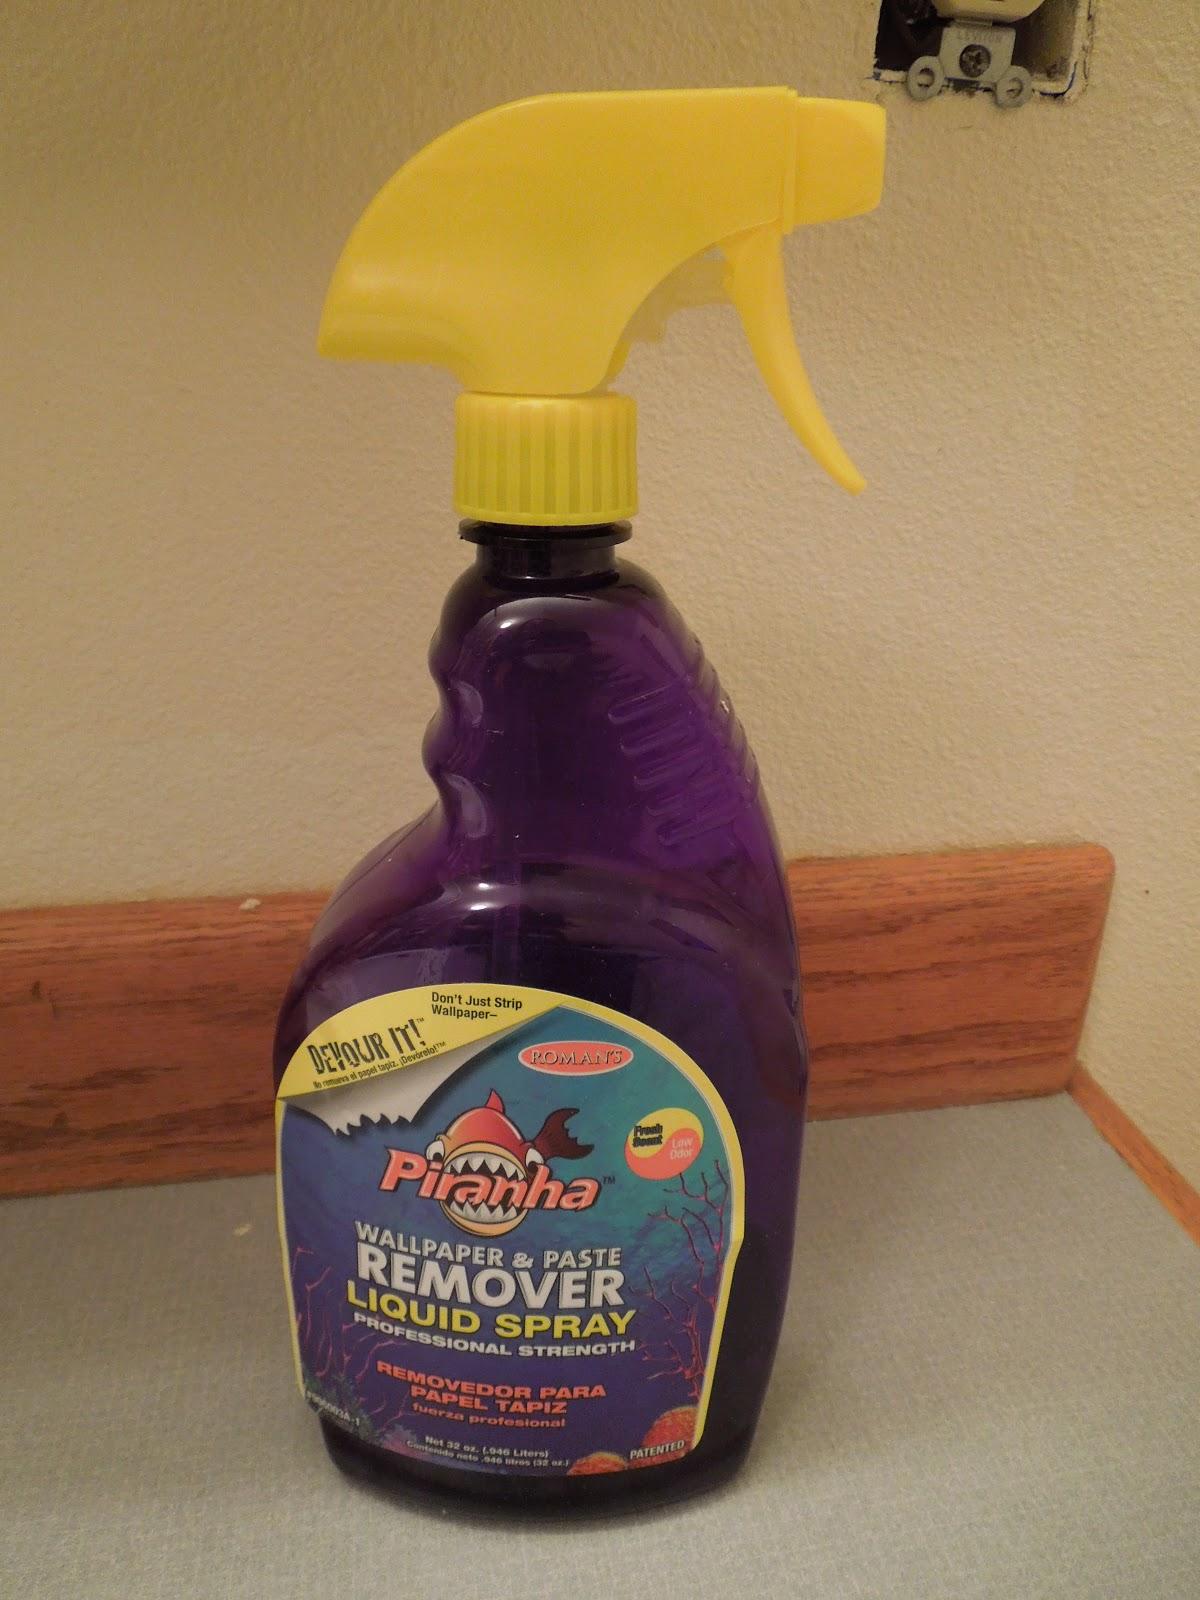 My Stuff Room / Galore-ious Stuff: Piranha = Wallpaper & Paste Remover Spray